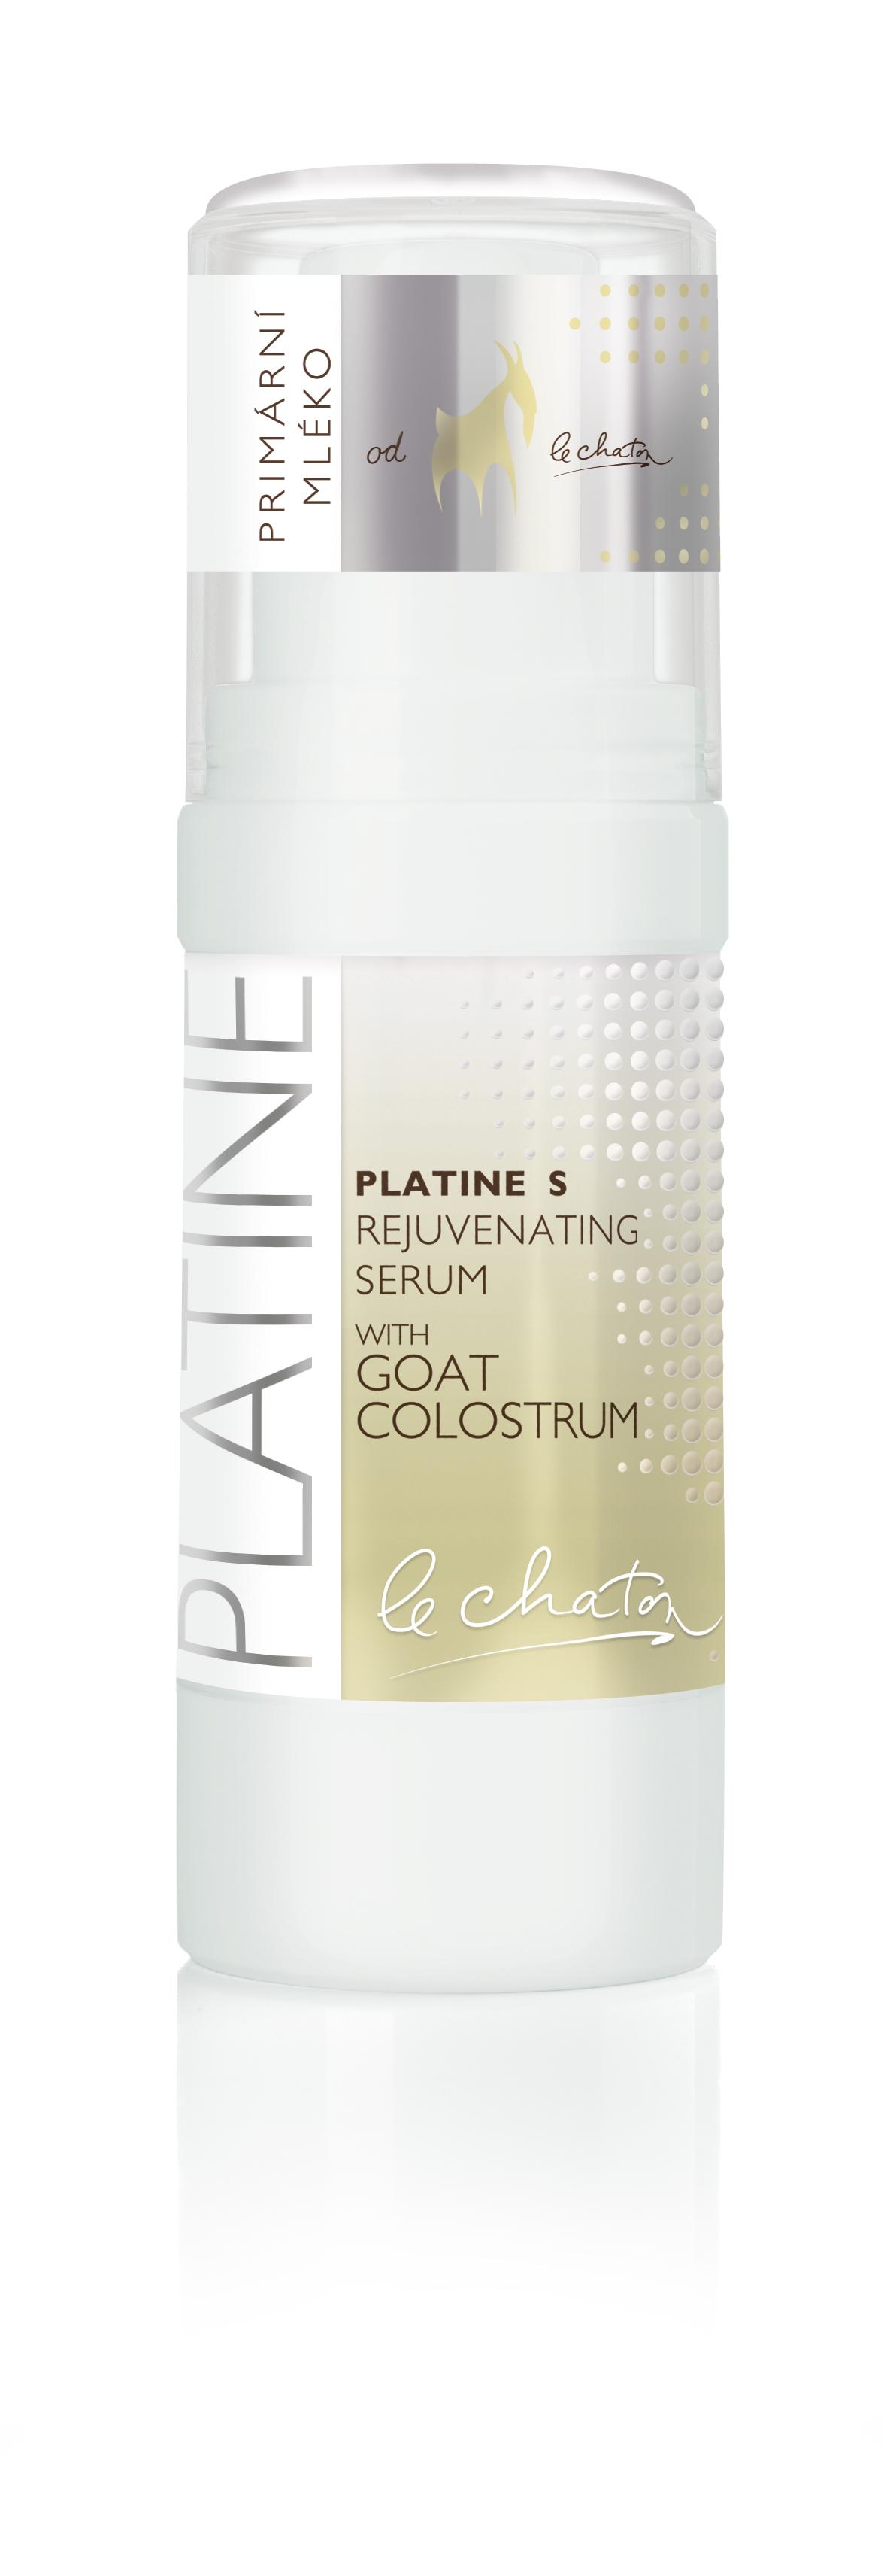 platineS-produkt